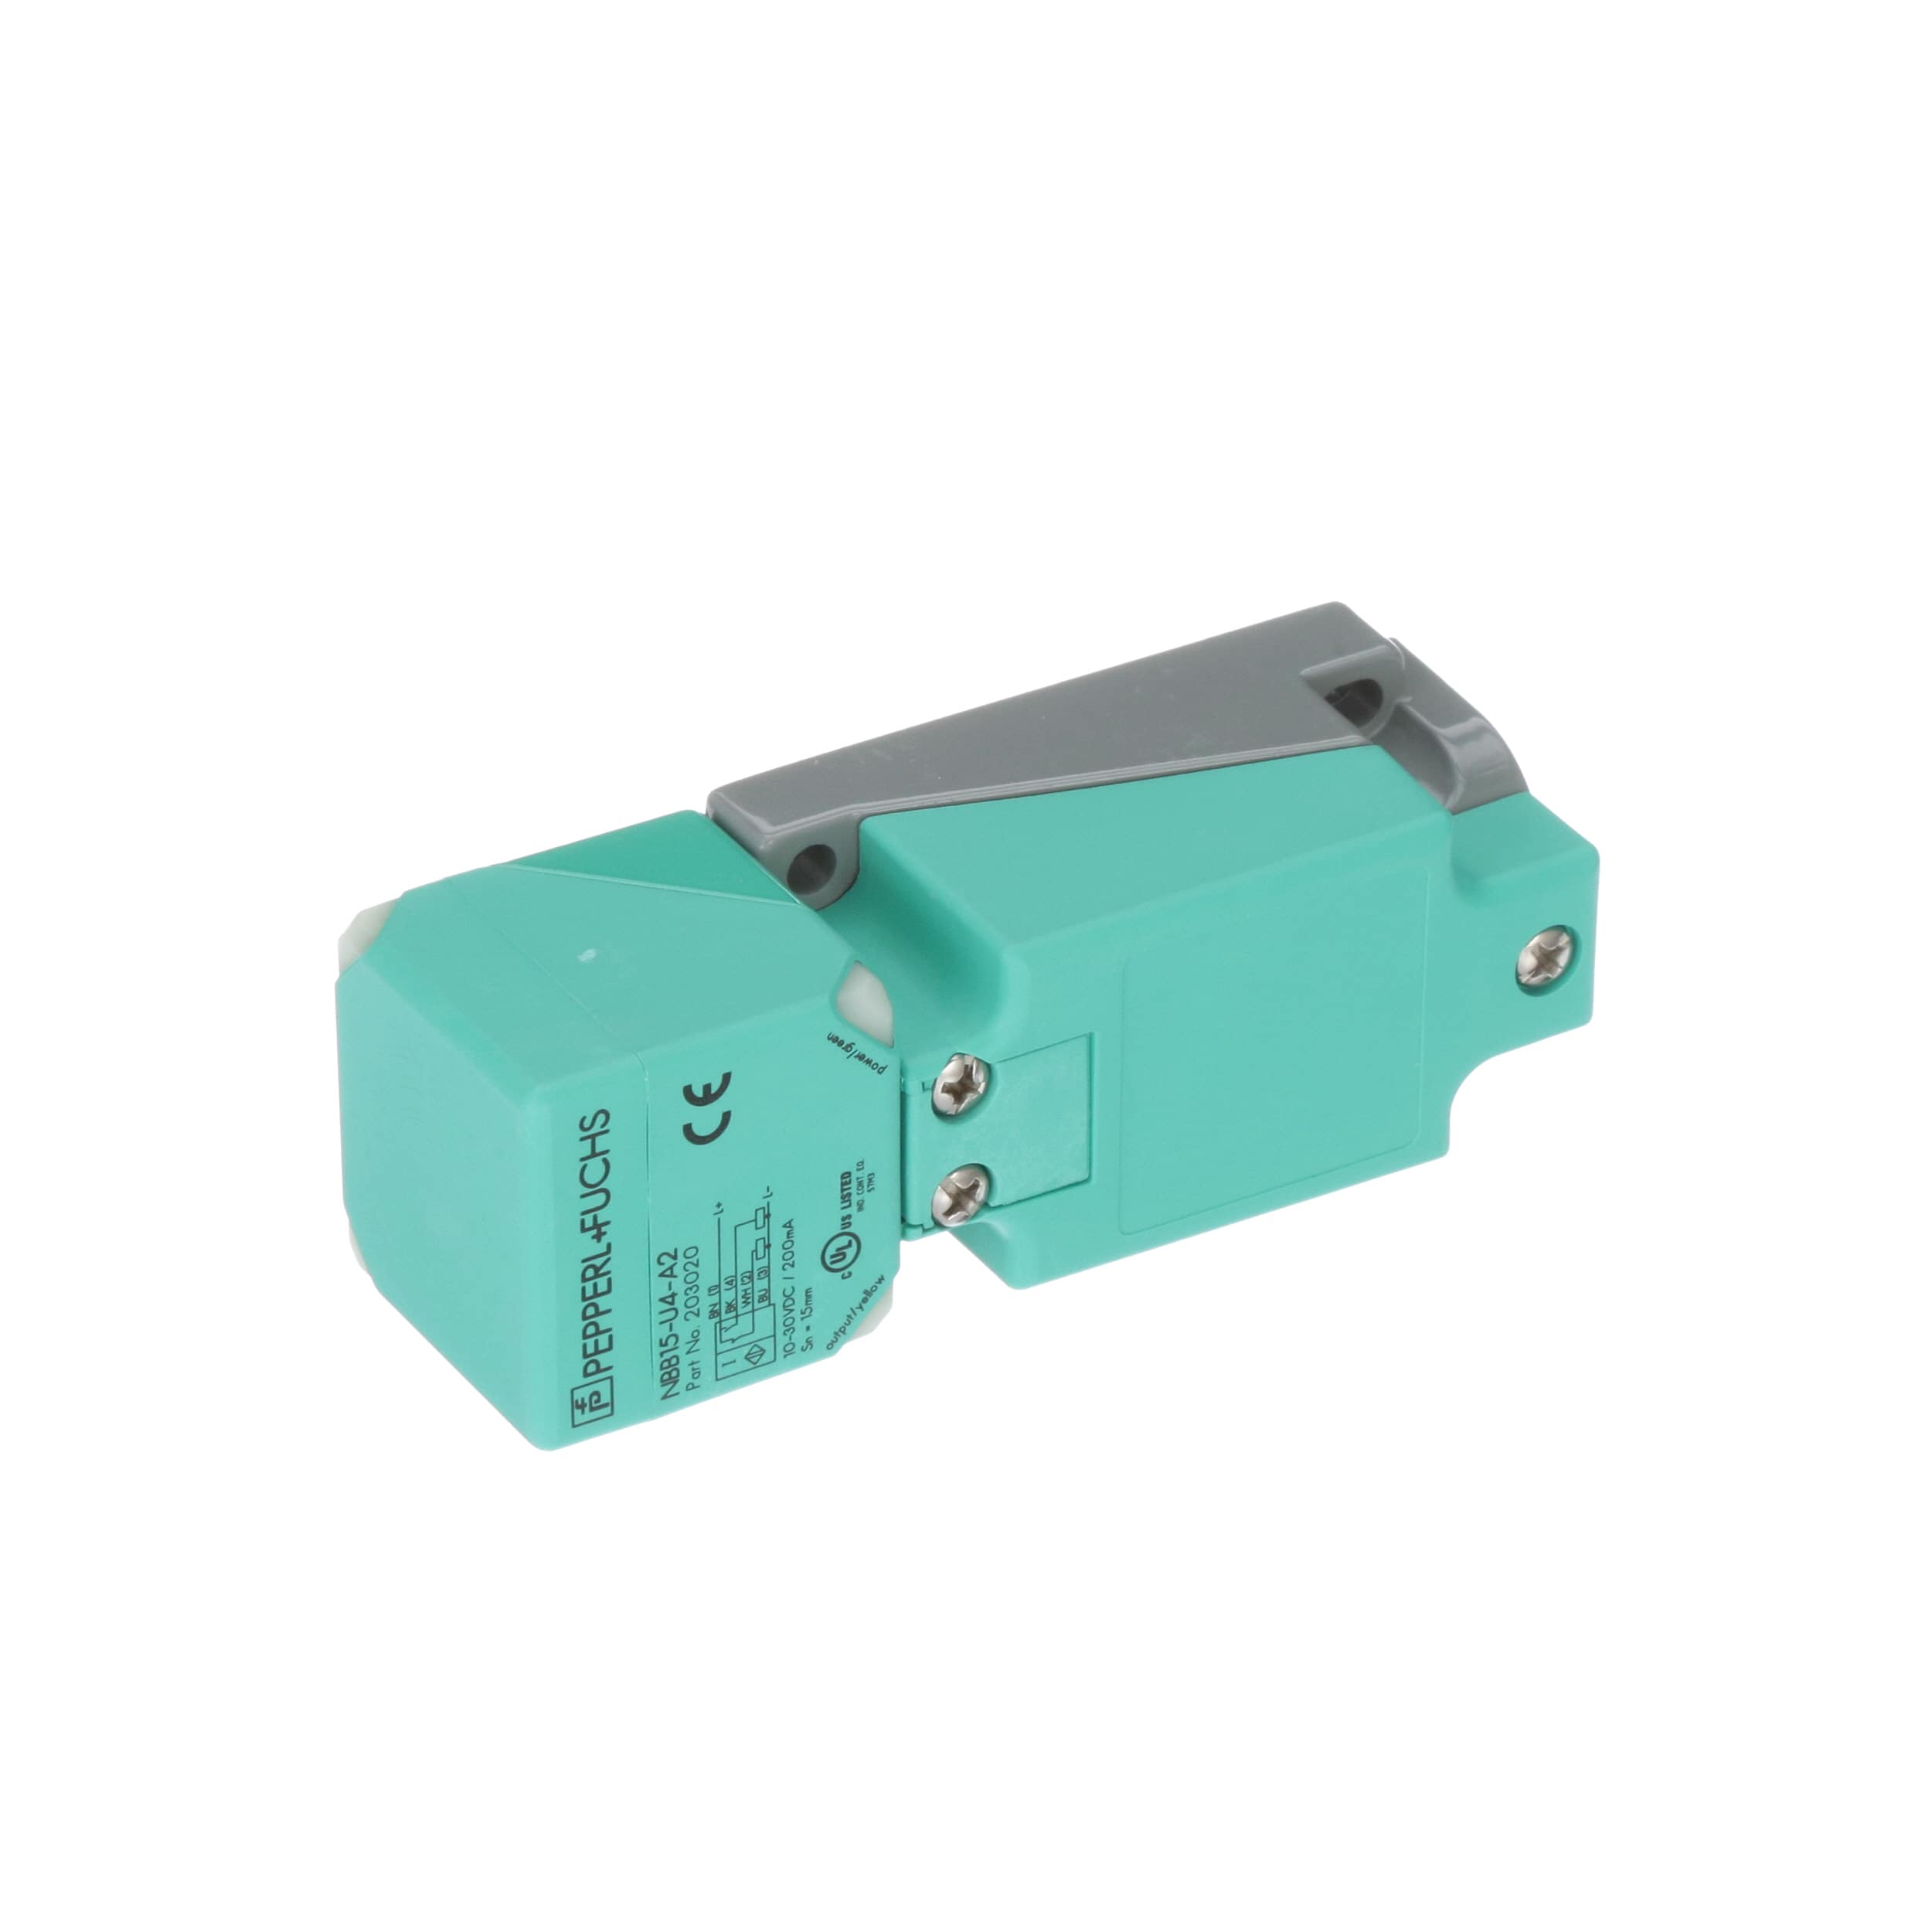 Pepperl+Fuchs Factory Automation - NBB15-U4-A2 - Proximity Sensor ...